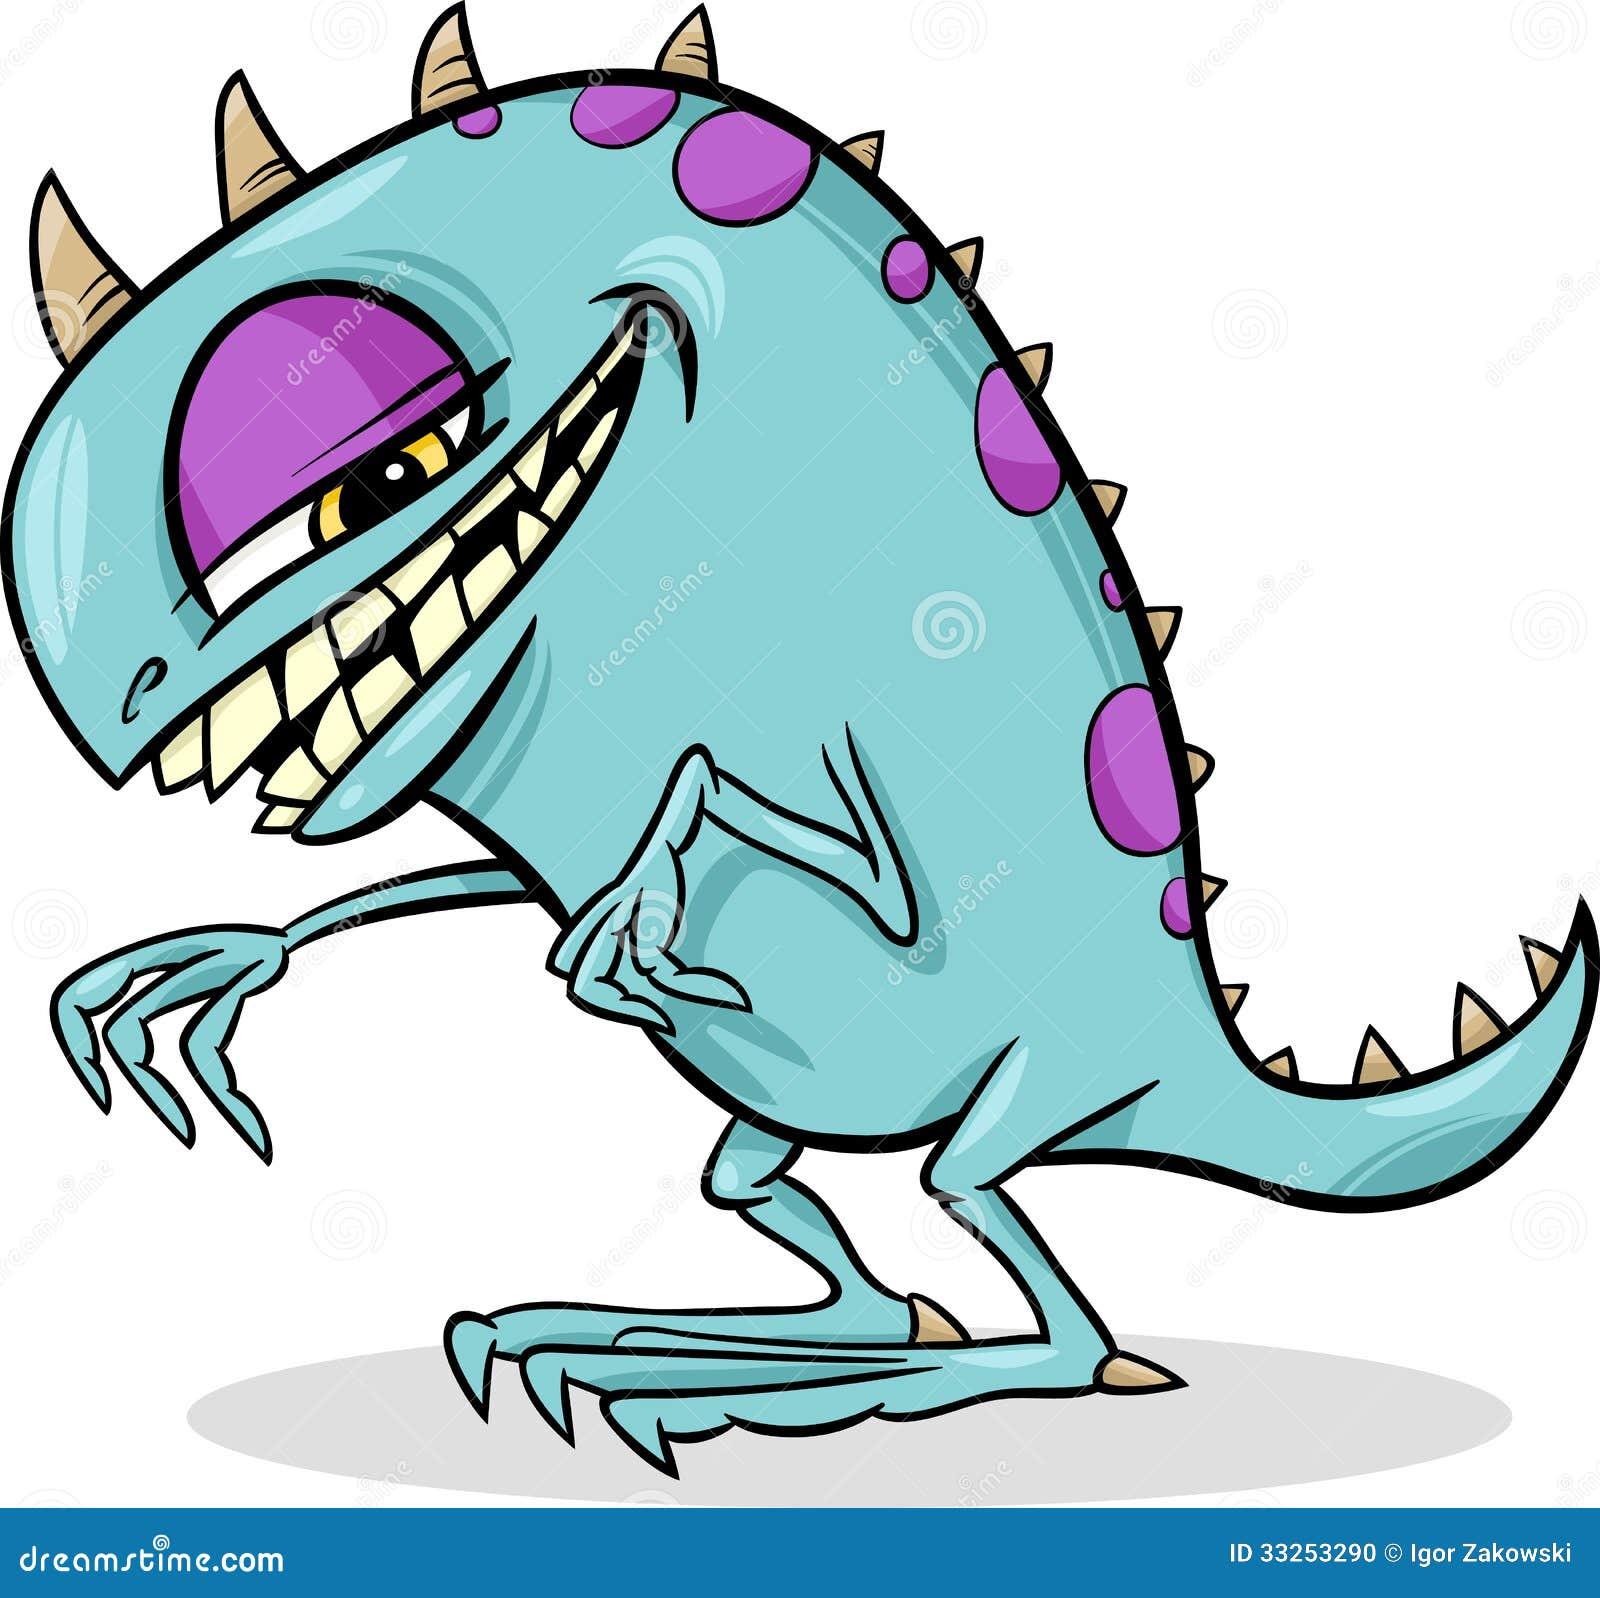 Cartoon Funny Monster Illustration Stock Photo - Image: 33253290